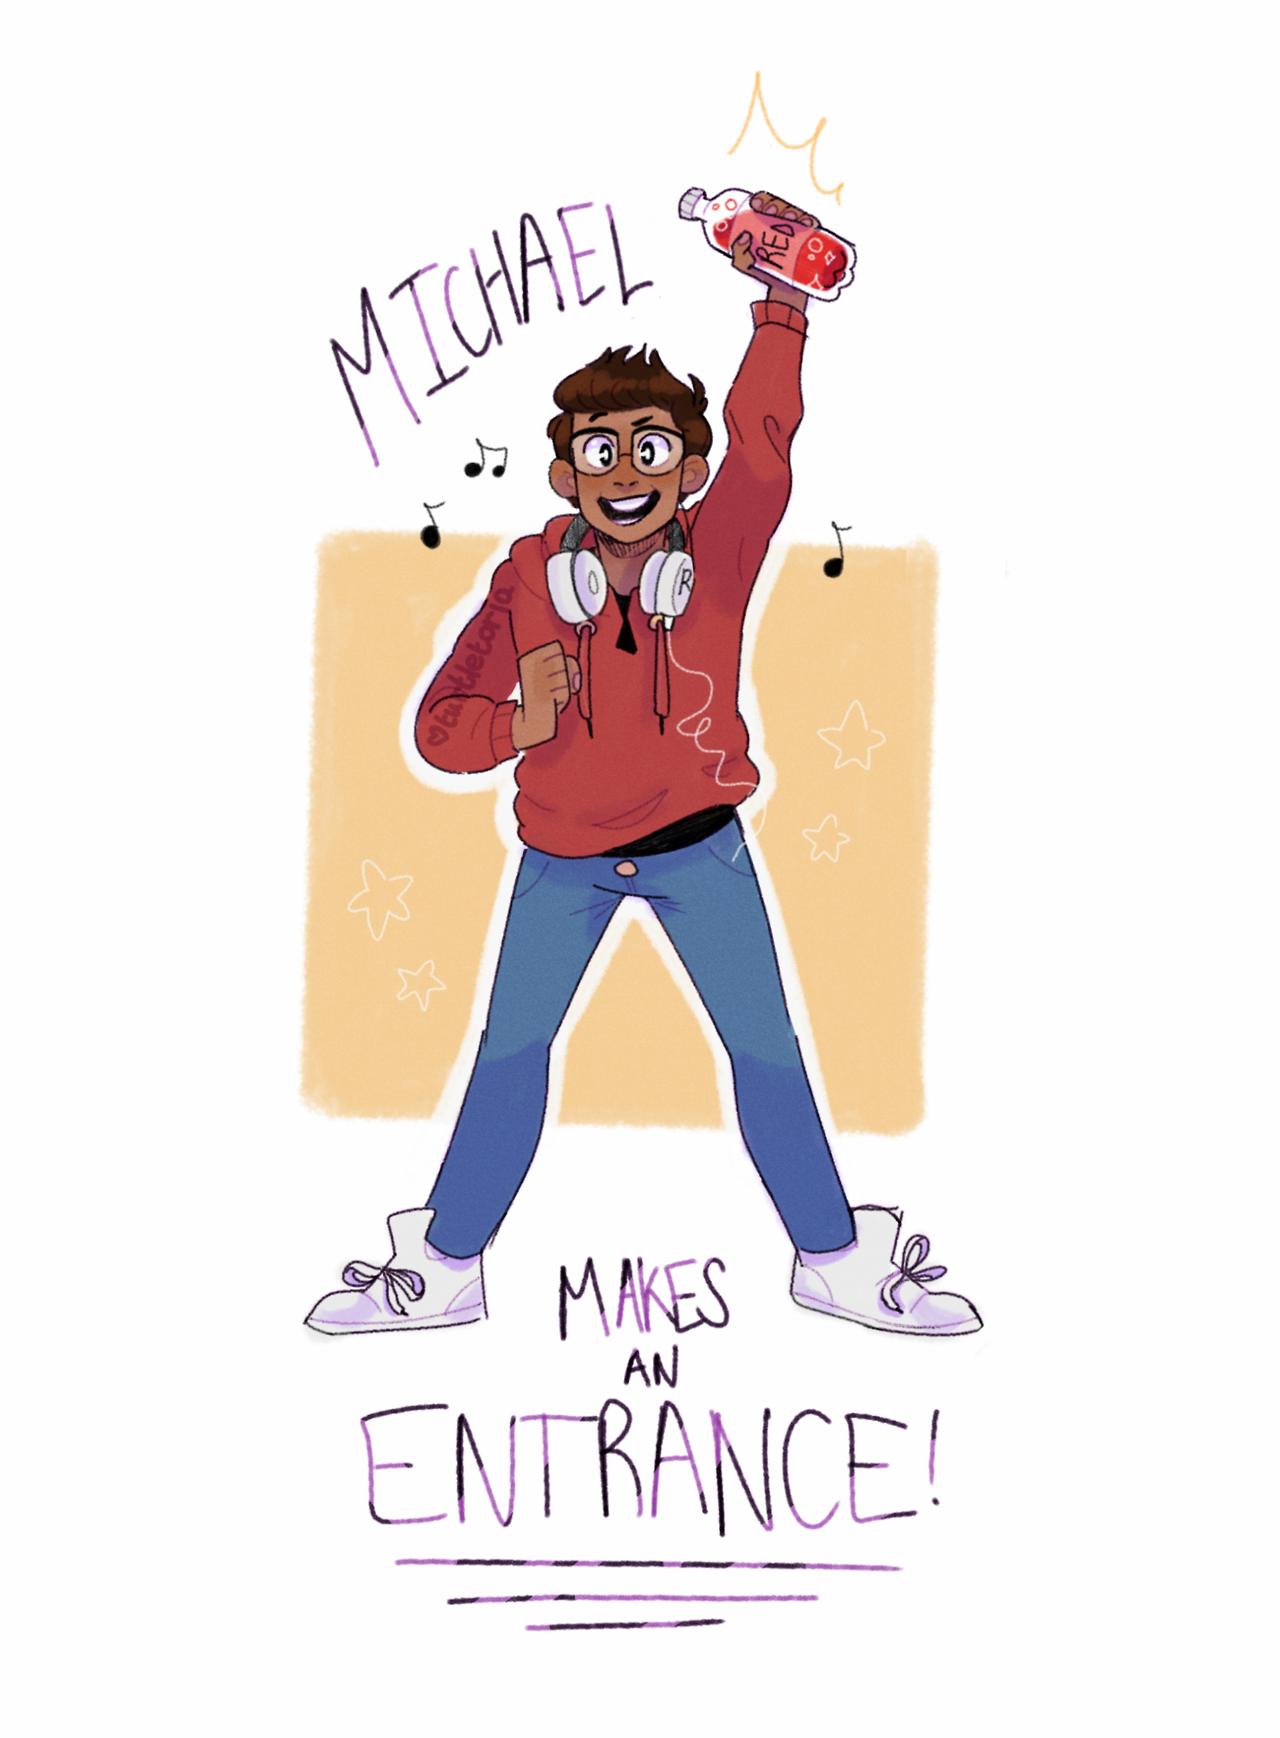 George Michael Bathroom: I Just,,,, I Love Him So Much